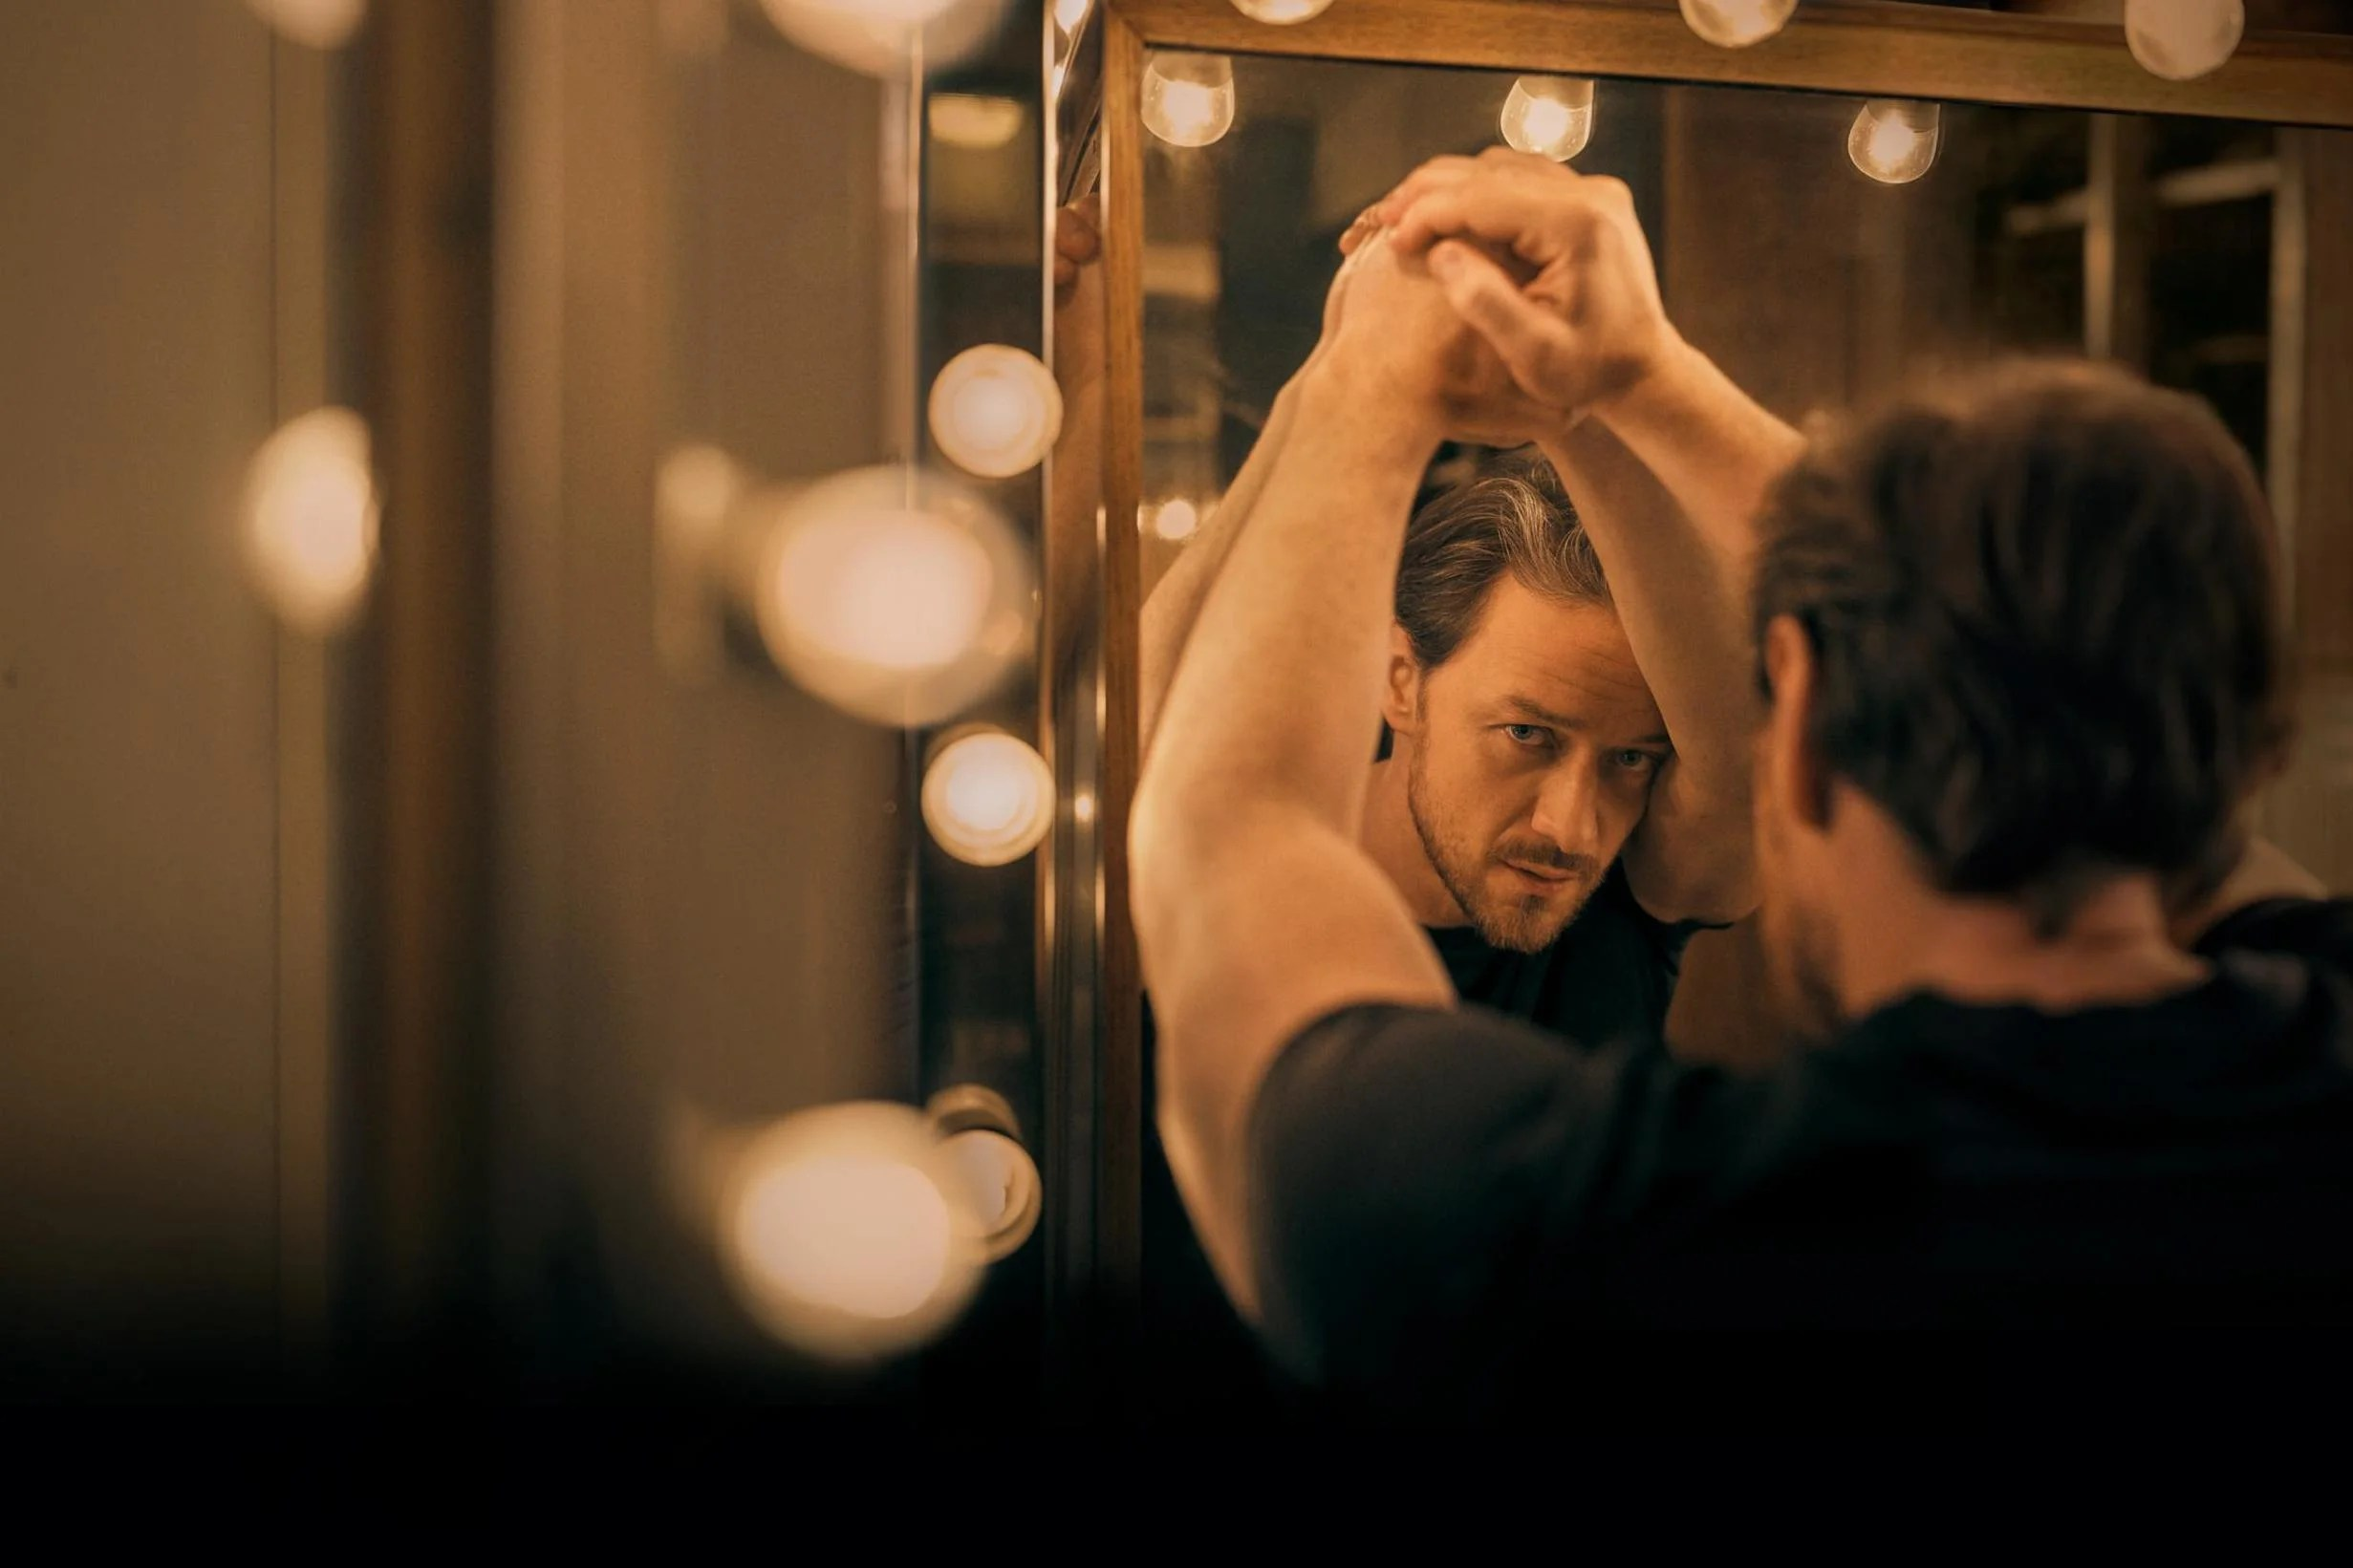 James Mcavoy In Cyrano De Bergerac At The Playhouse